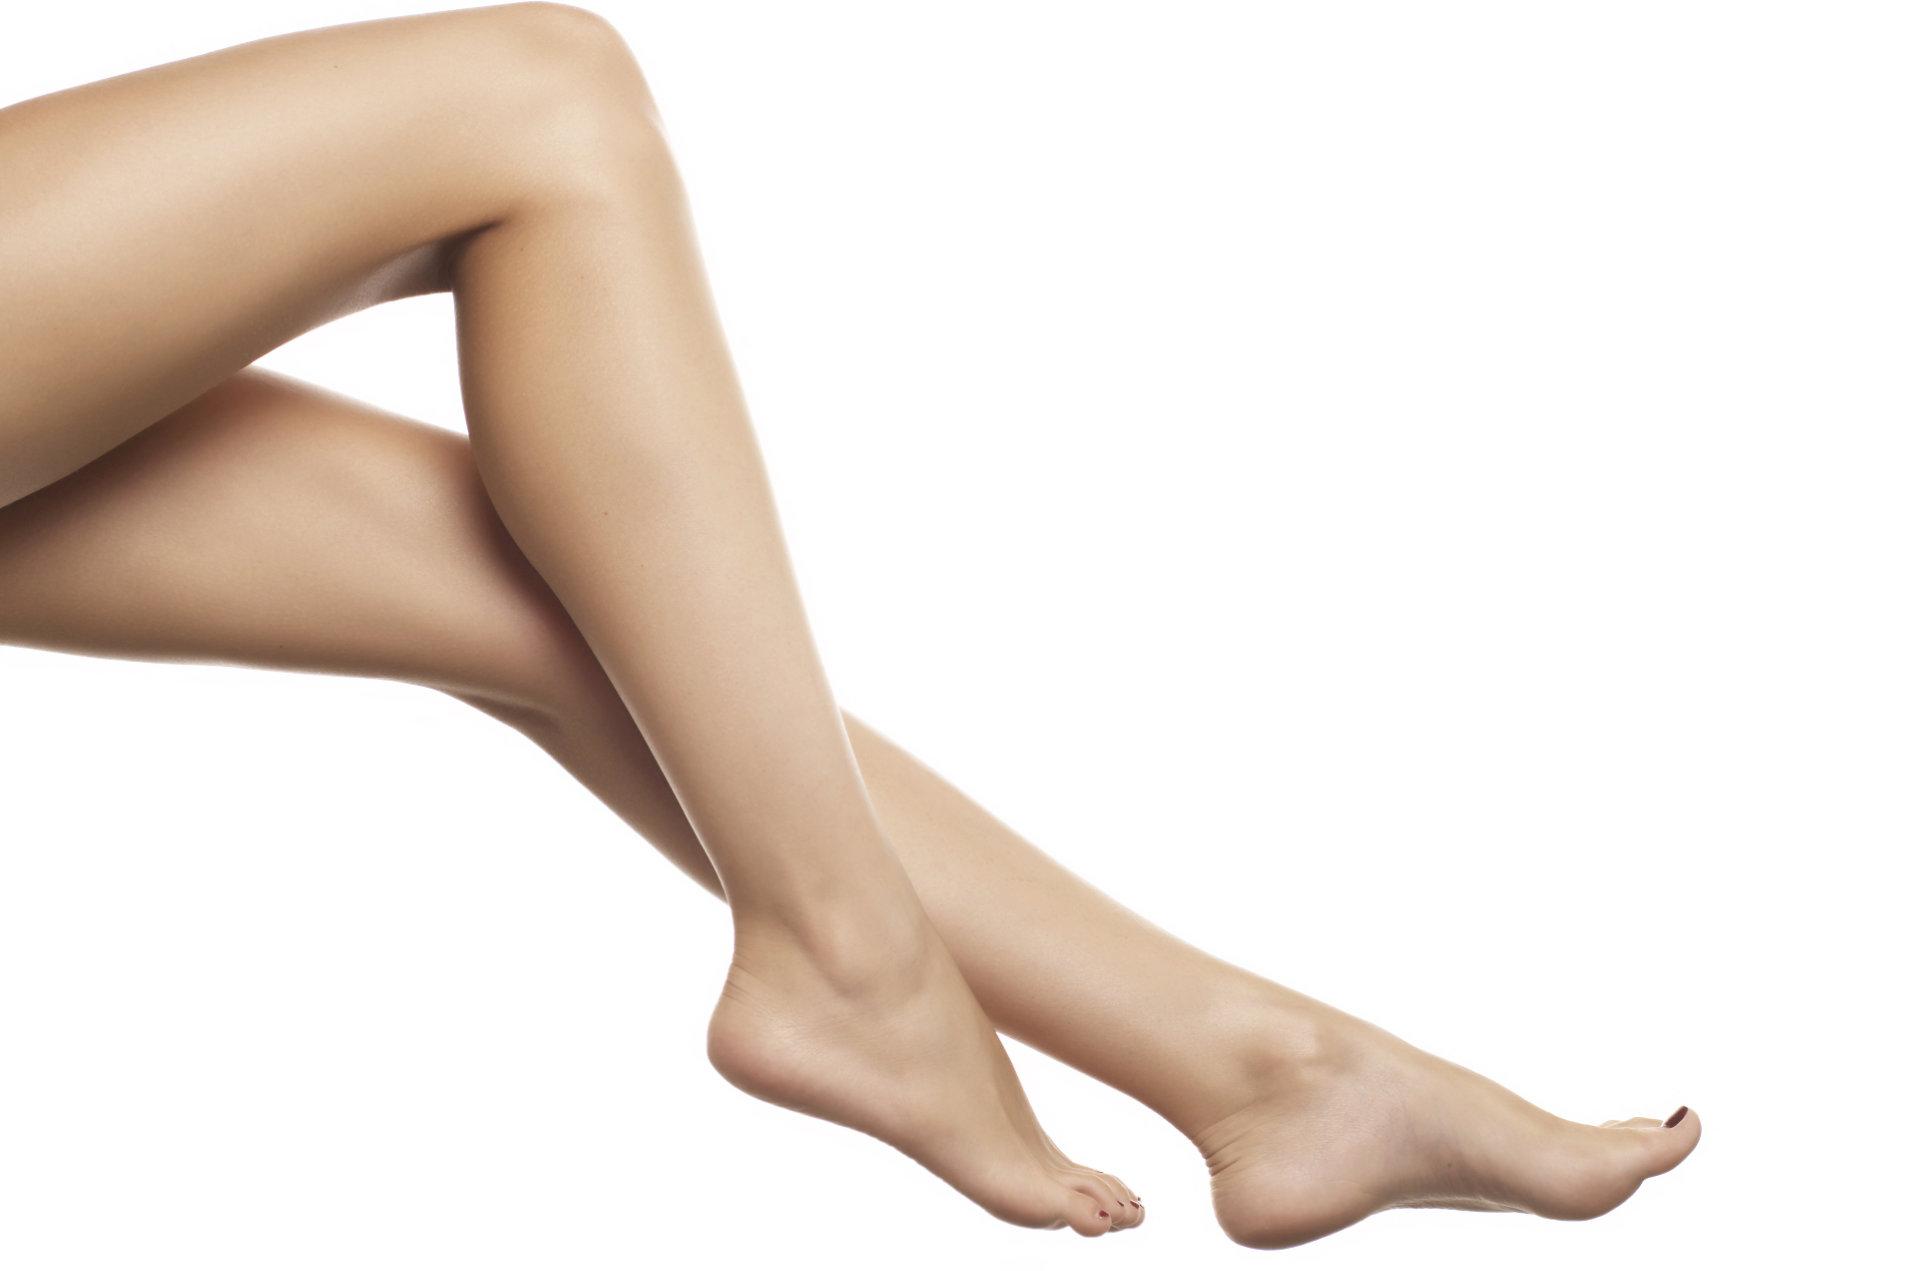 Female legs showcase Laser Hair Removal